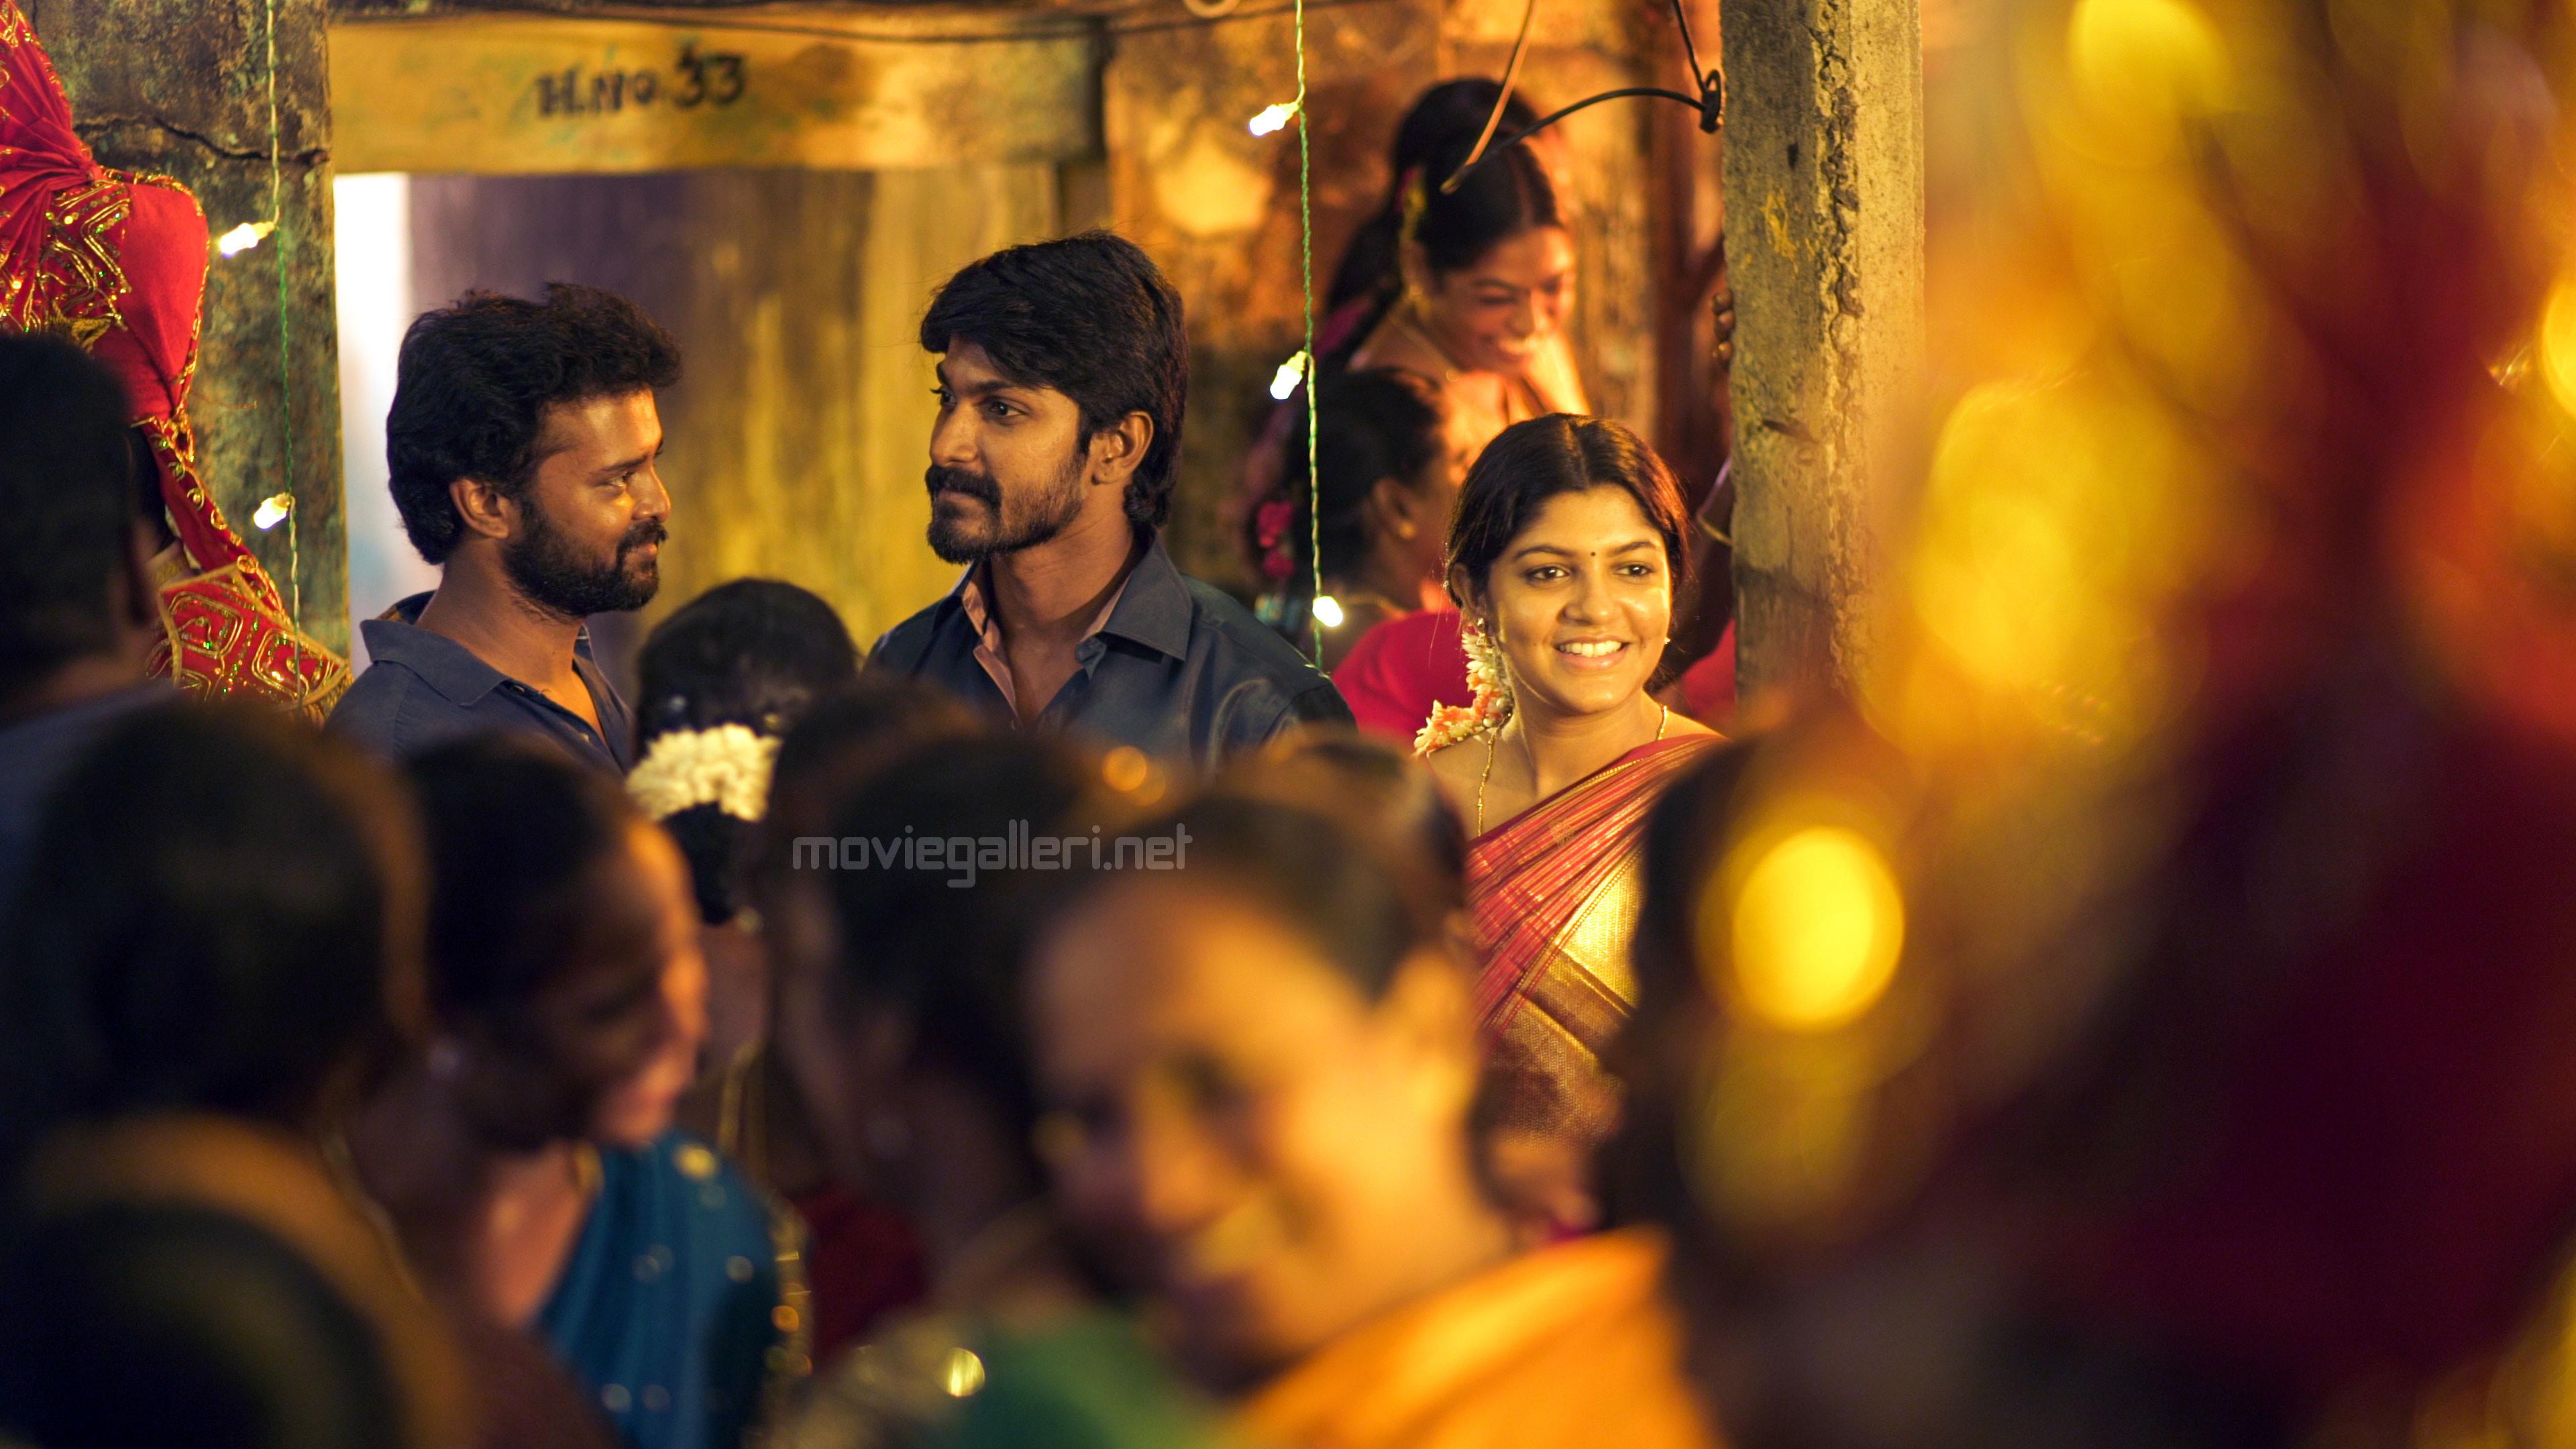 Rasu Ranjith, Easan, Aparna Balamurali in Theethum Nandrum Movie Pics HD